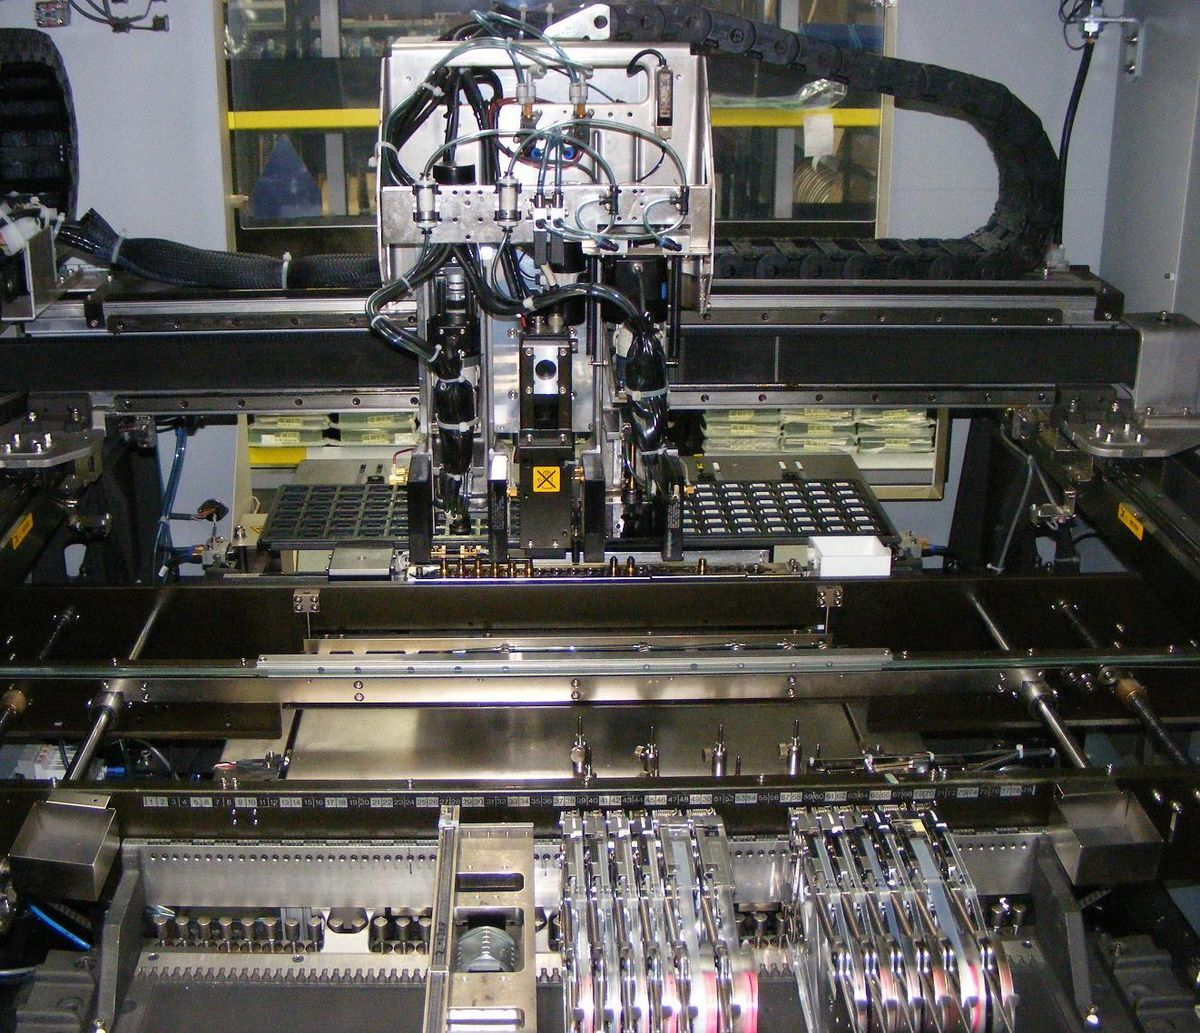 edm_machine.JPG